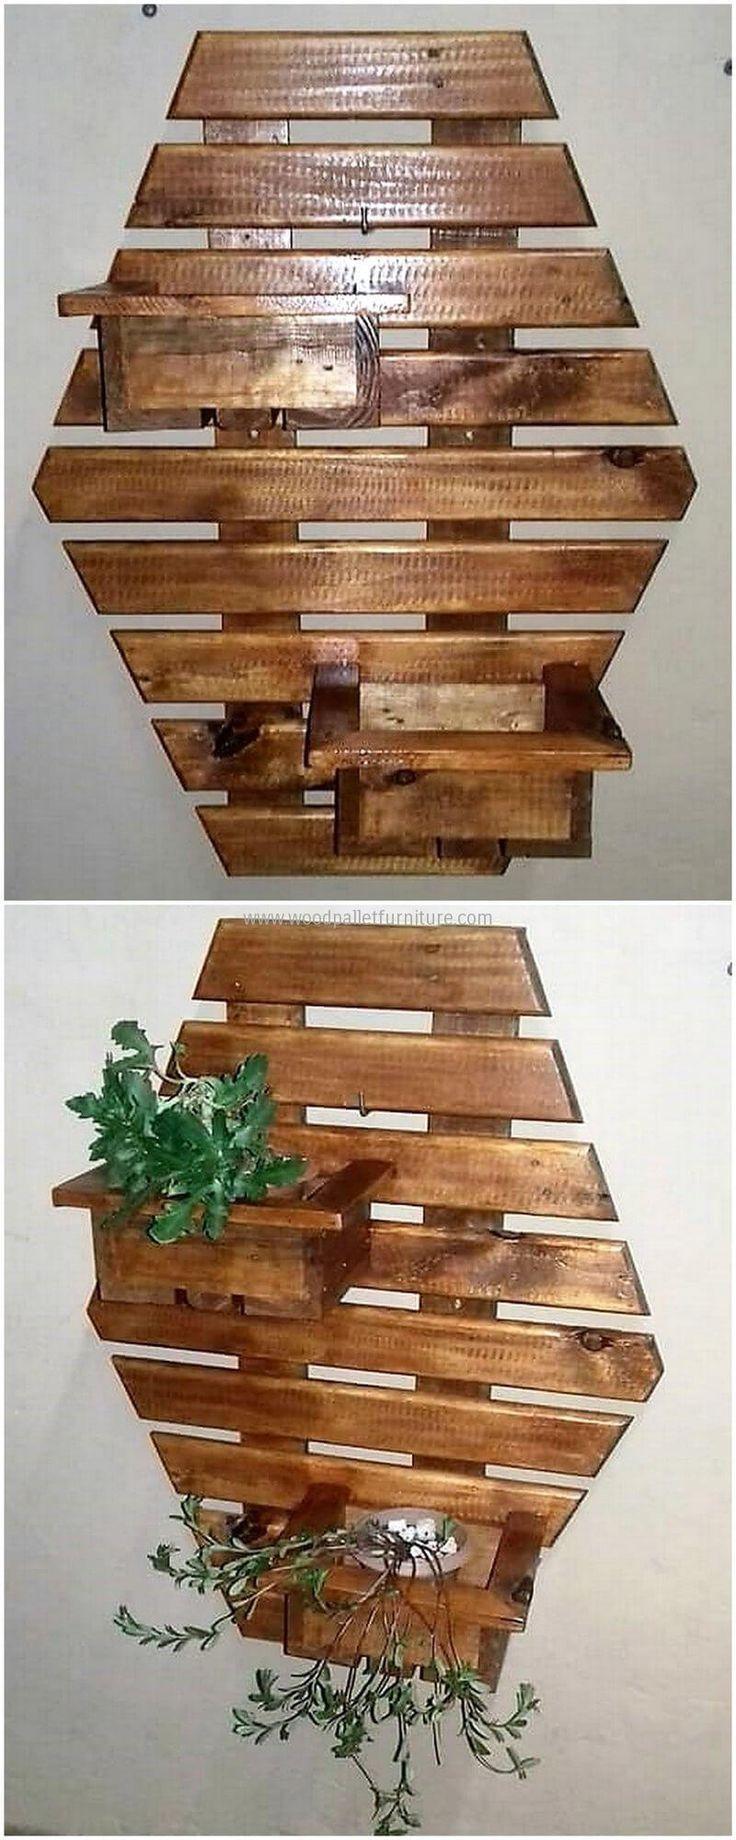 best decoração rústica images on pinterest shelving brackets